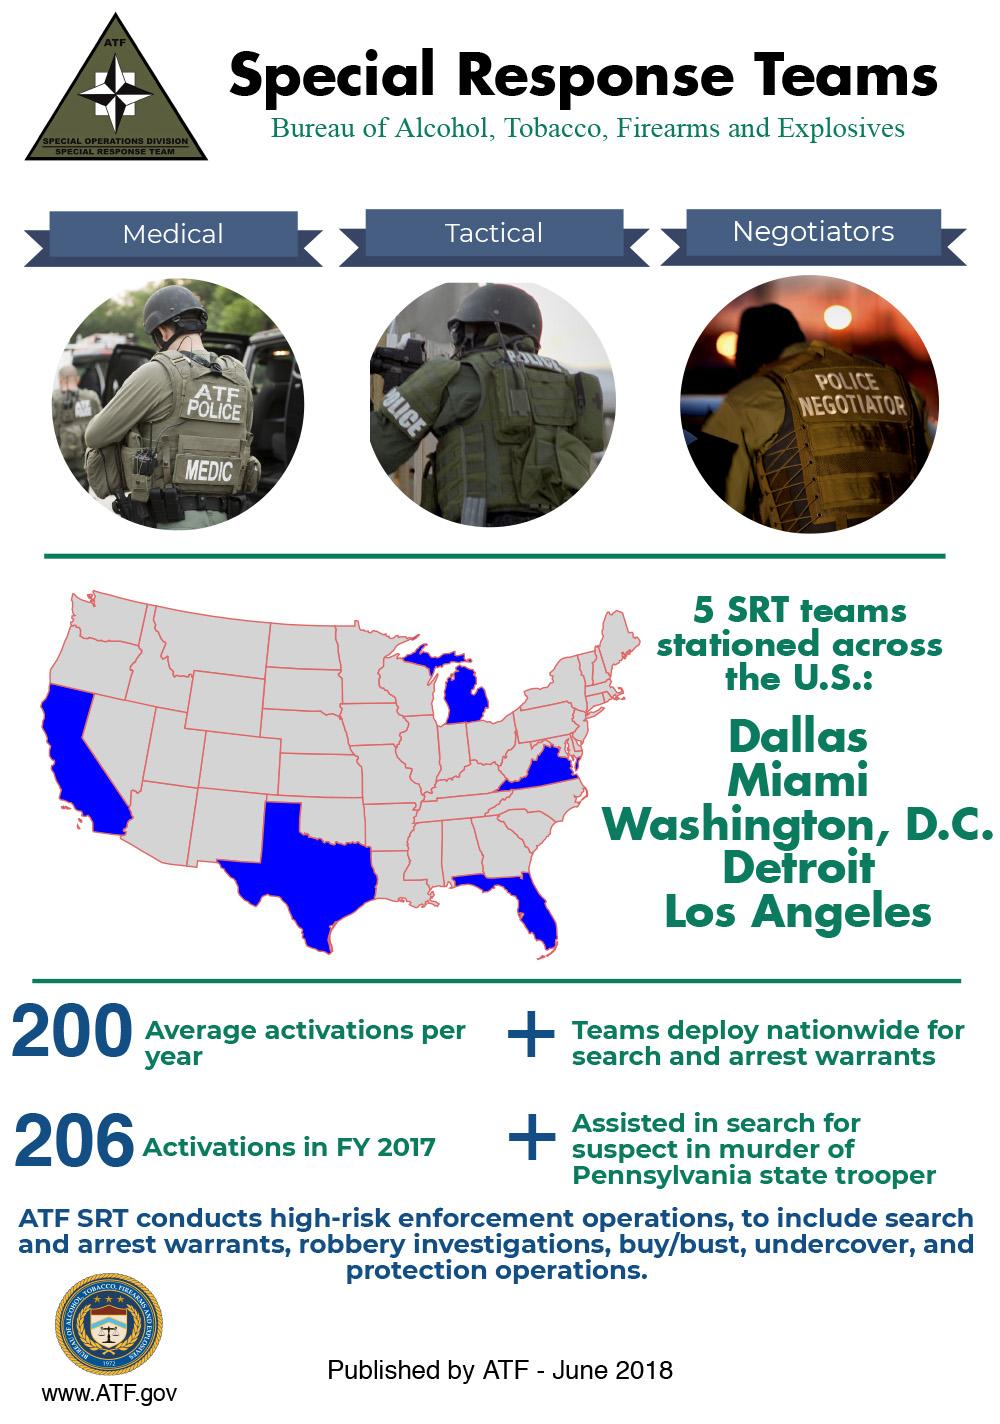 ATF Special Response Teams (SRT)